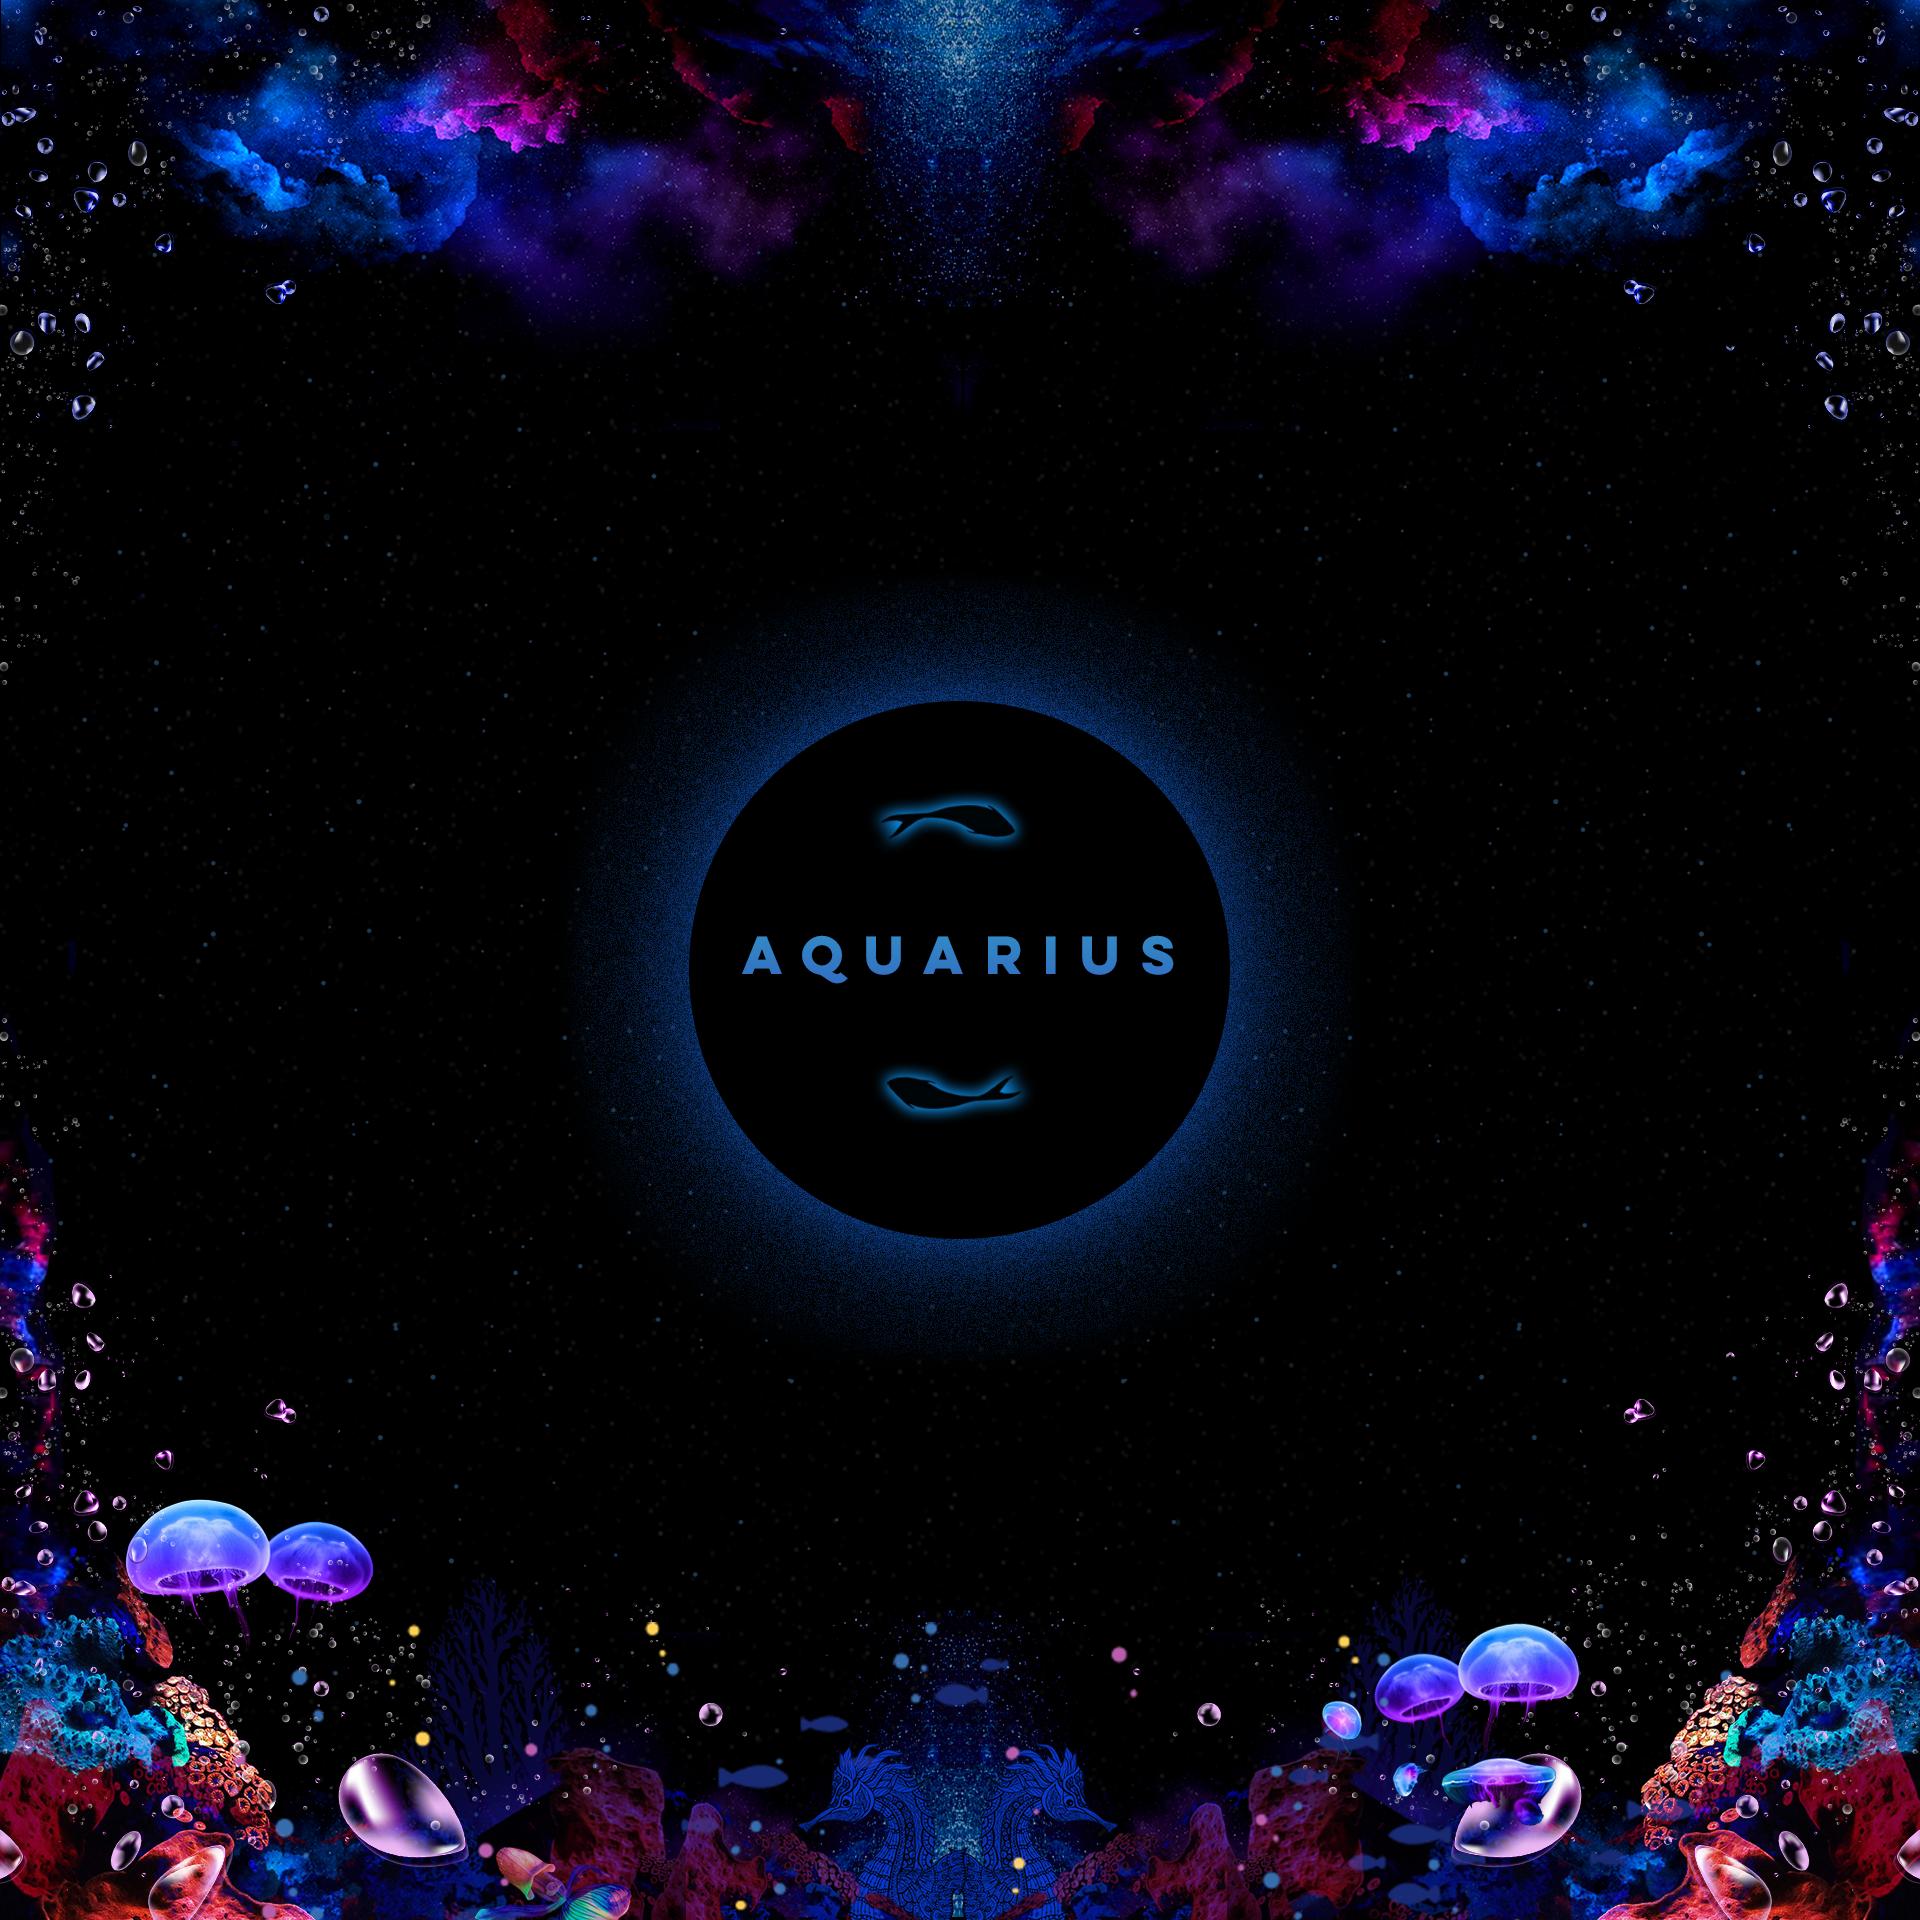 AQUARIUS QUESTIONS 2020